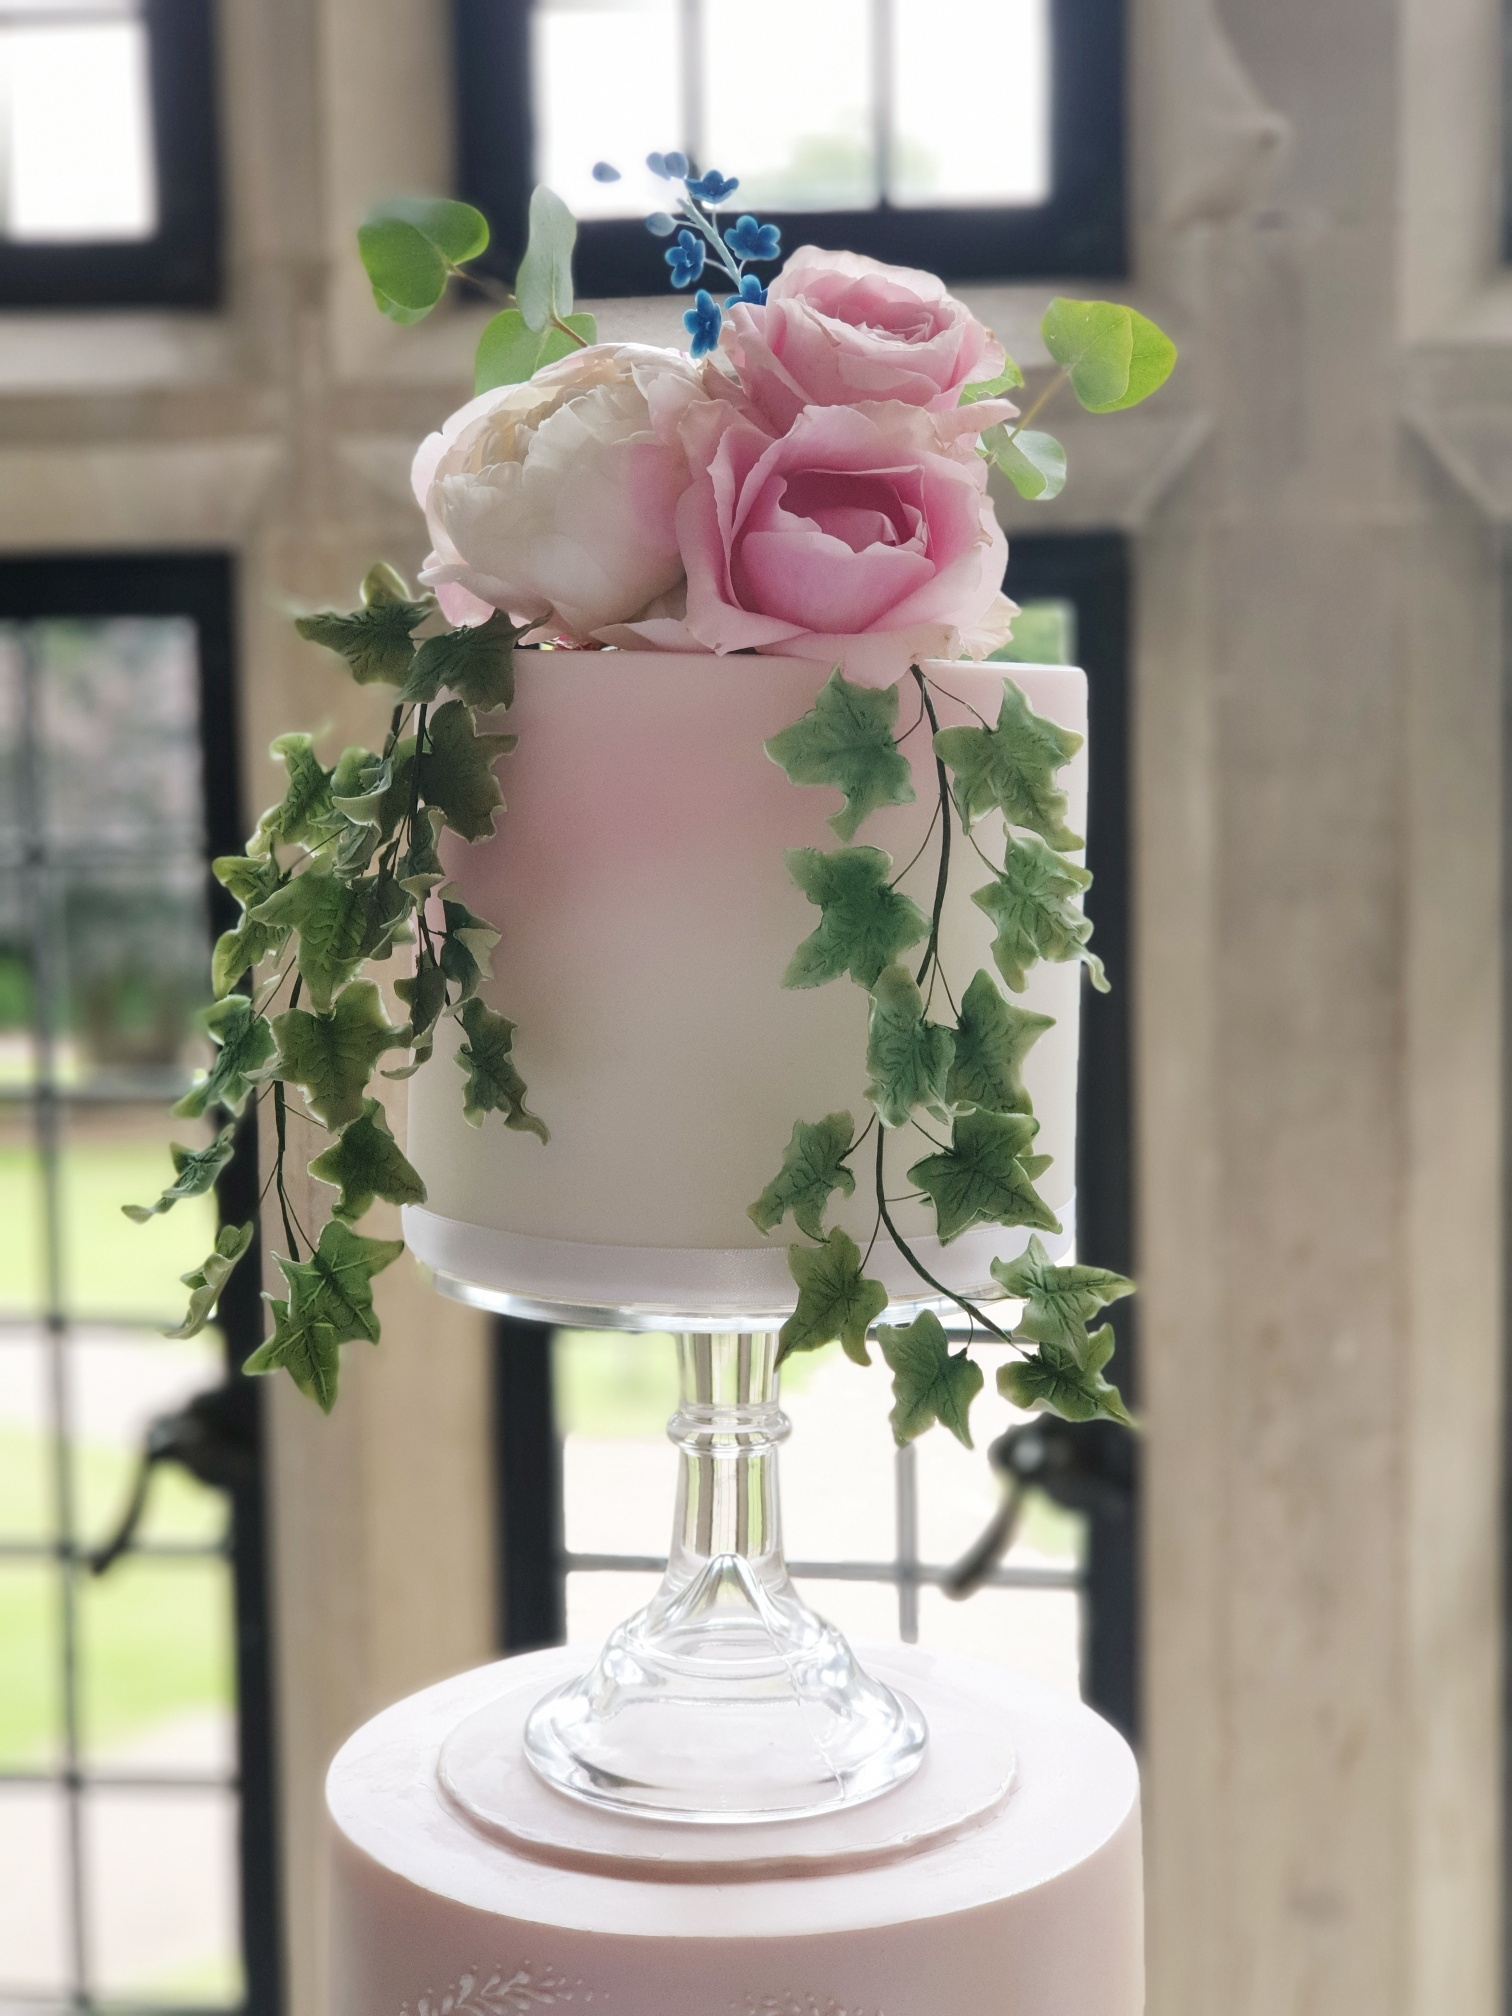 Sugar Crafted Ivy/ pink airbrushing